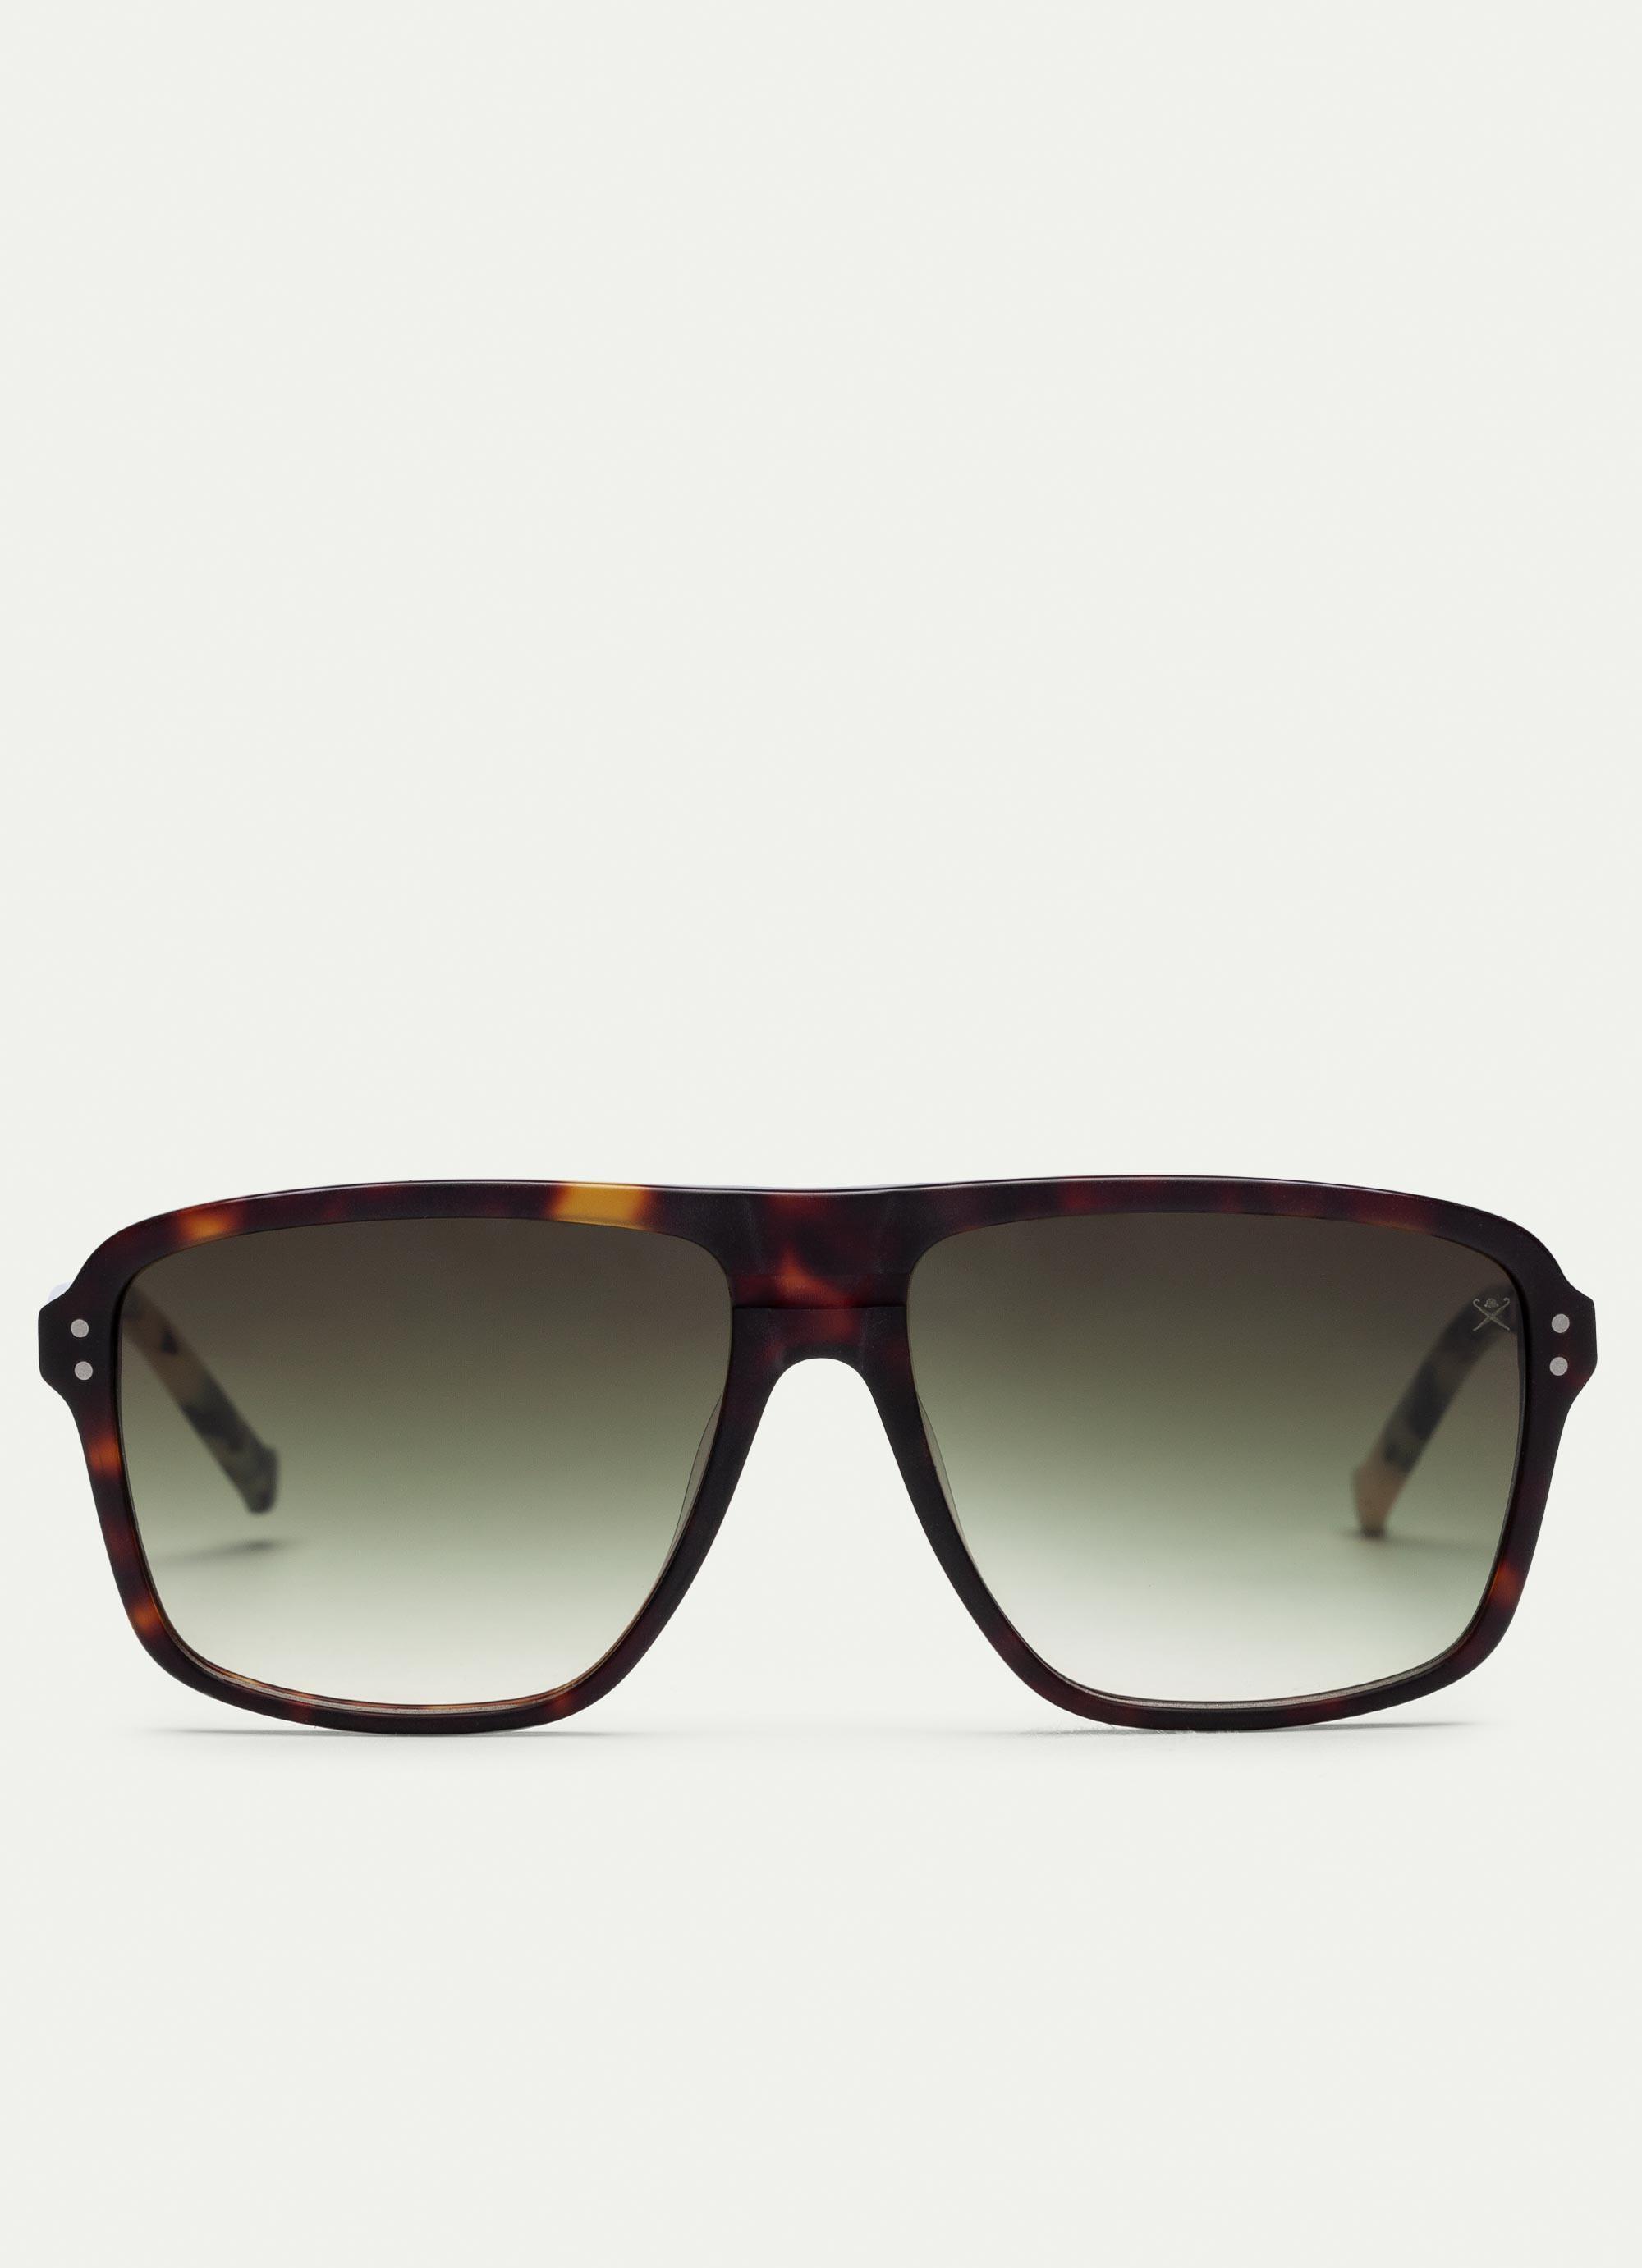 f97a55a1516 Hackett Pilot Oversized Acetate Sunglasses for Men - Lyst